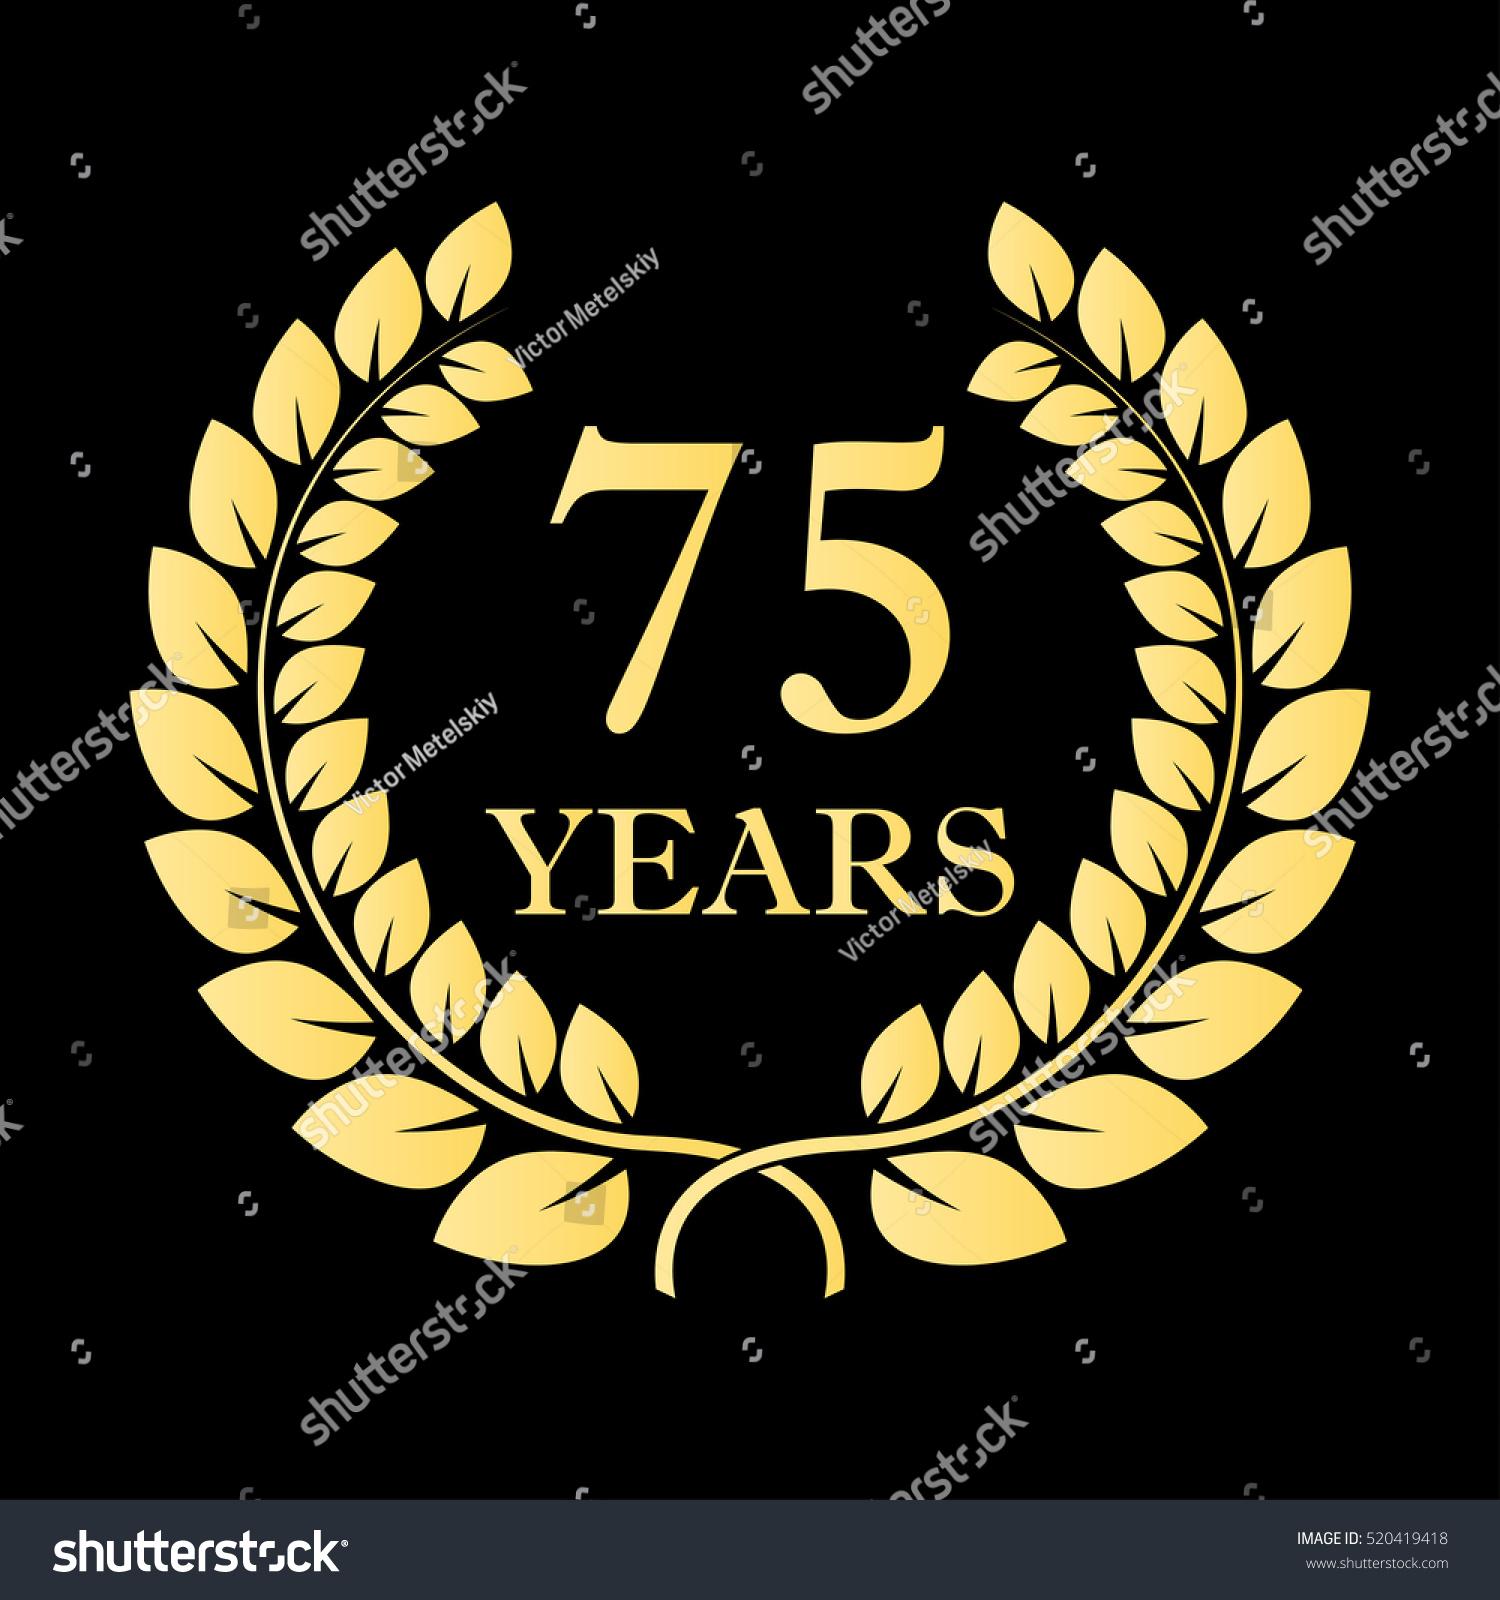 75 Years Icon 75th Anniversary Birthday Stock Vector Royalty Free